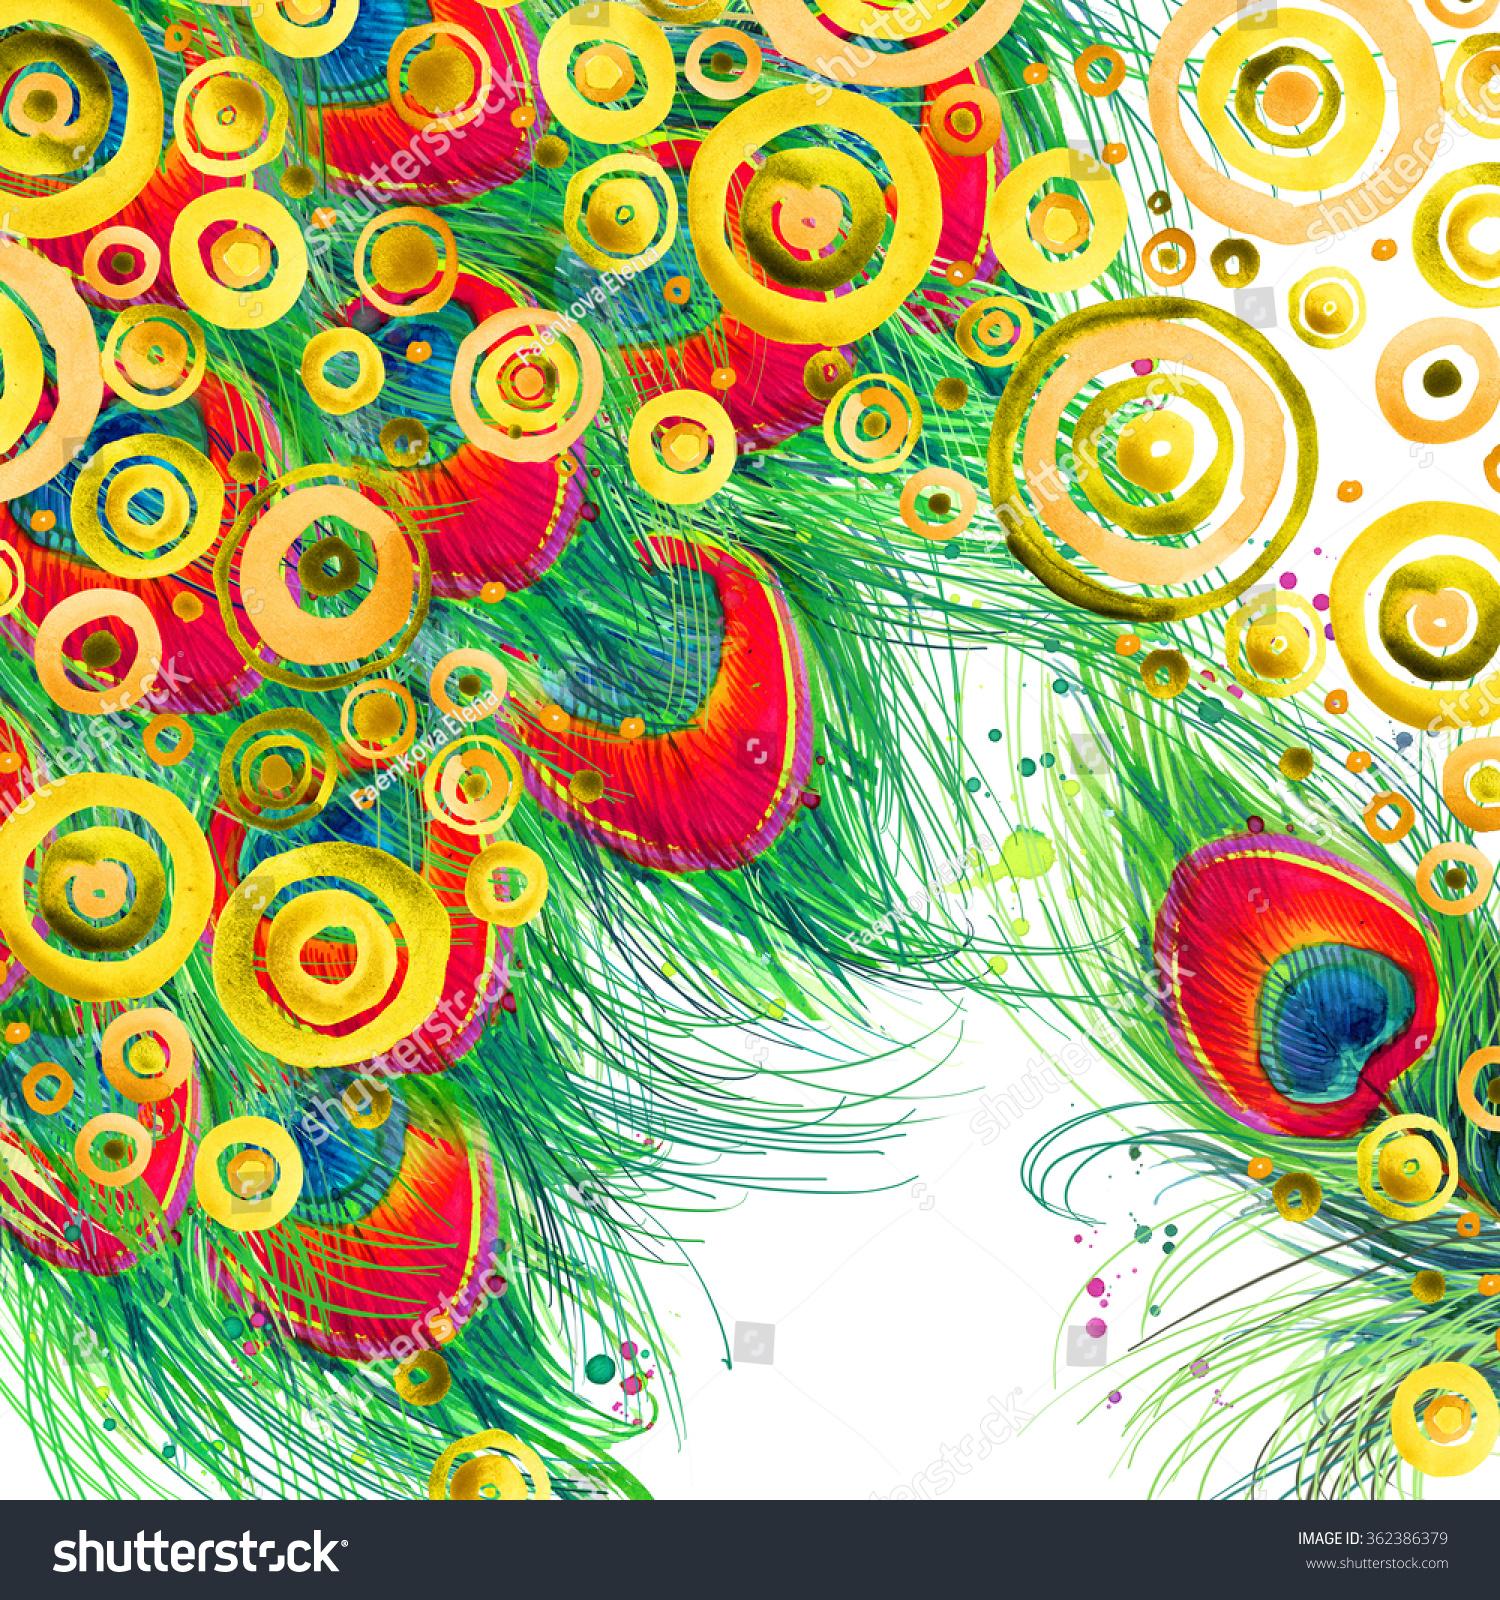 Abstract Peacock Drawing